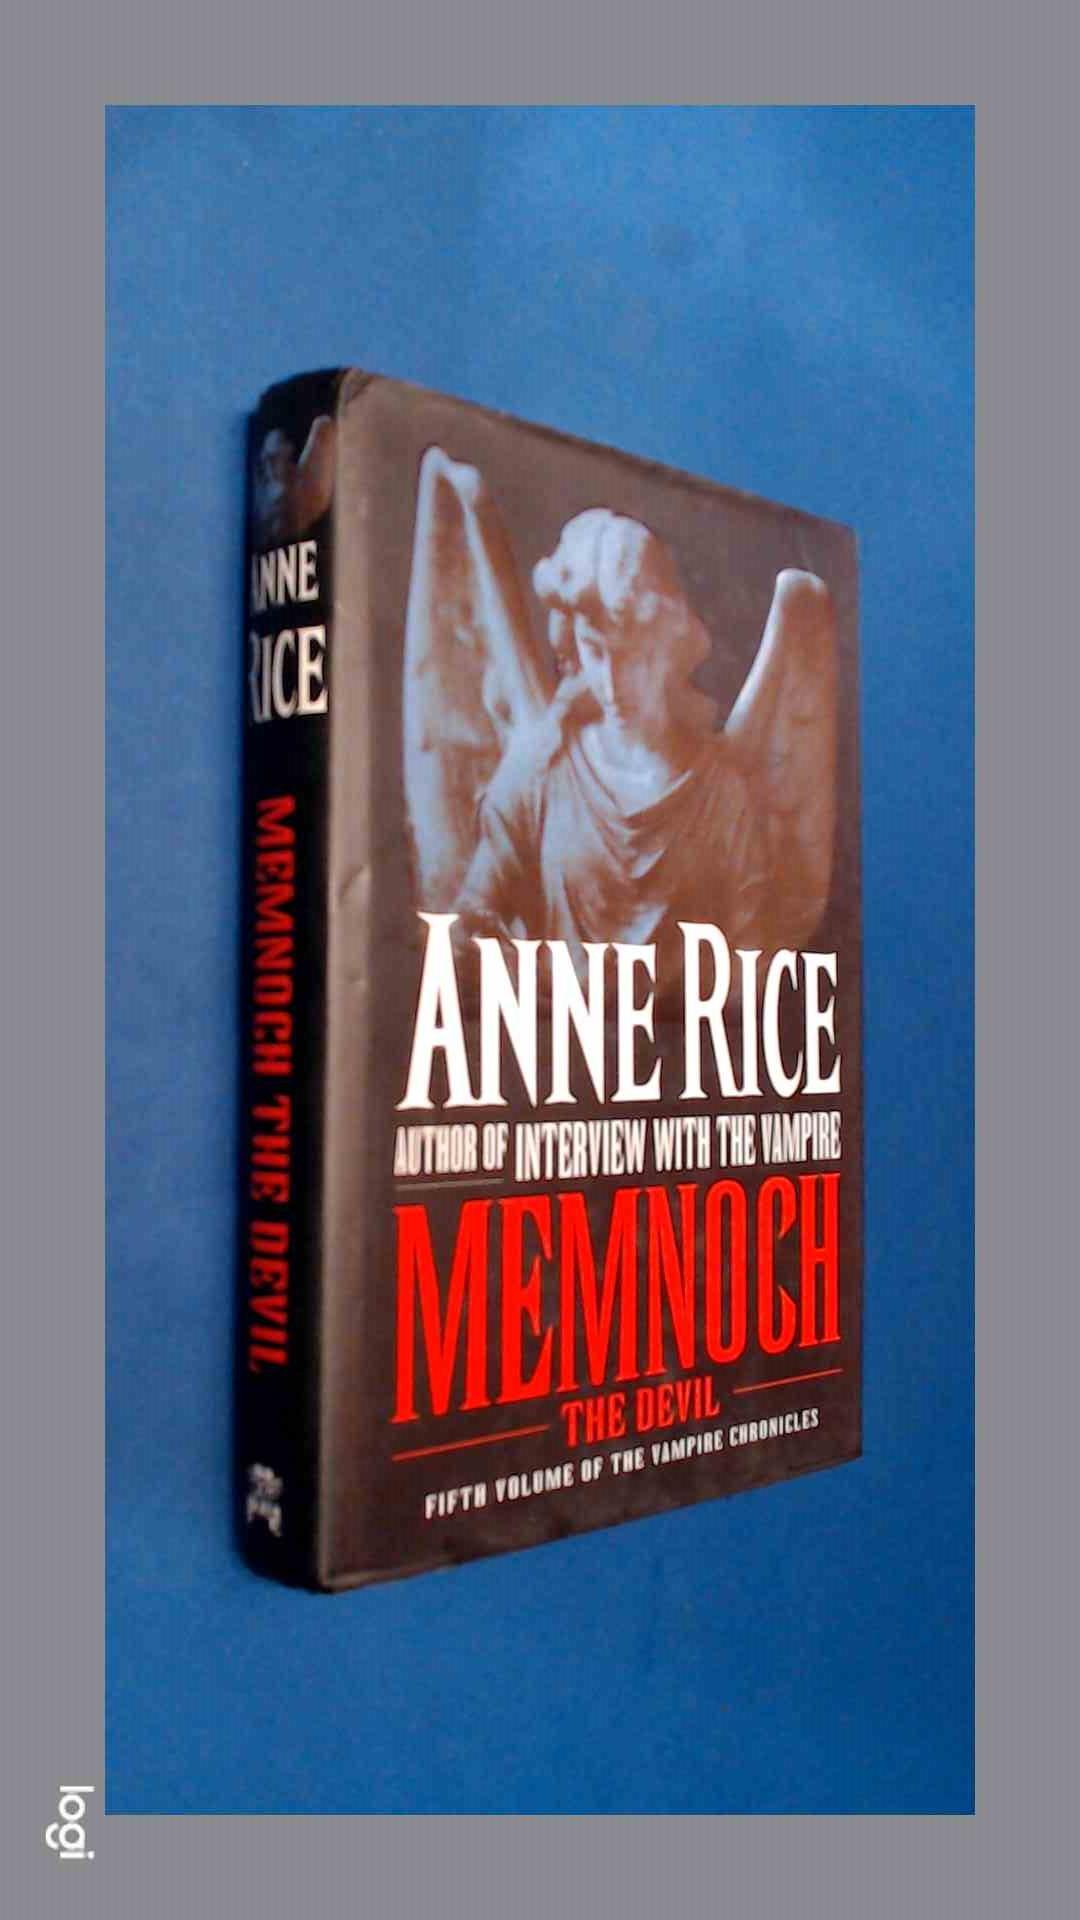 RICE, ANNE - Memnoch the devil